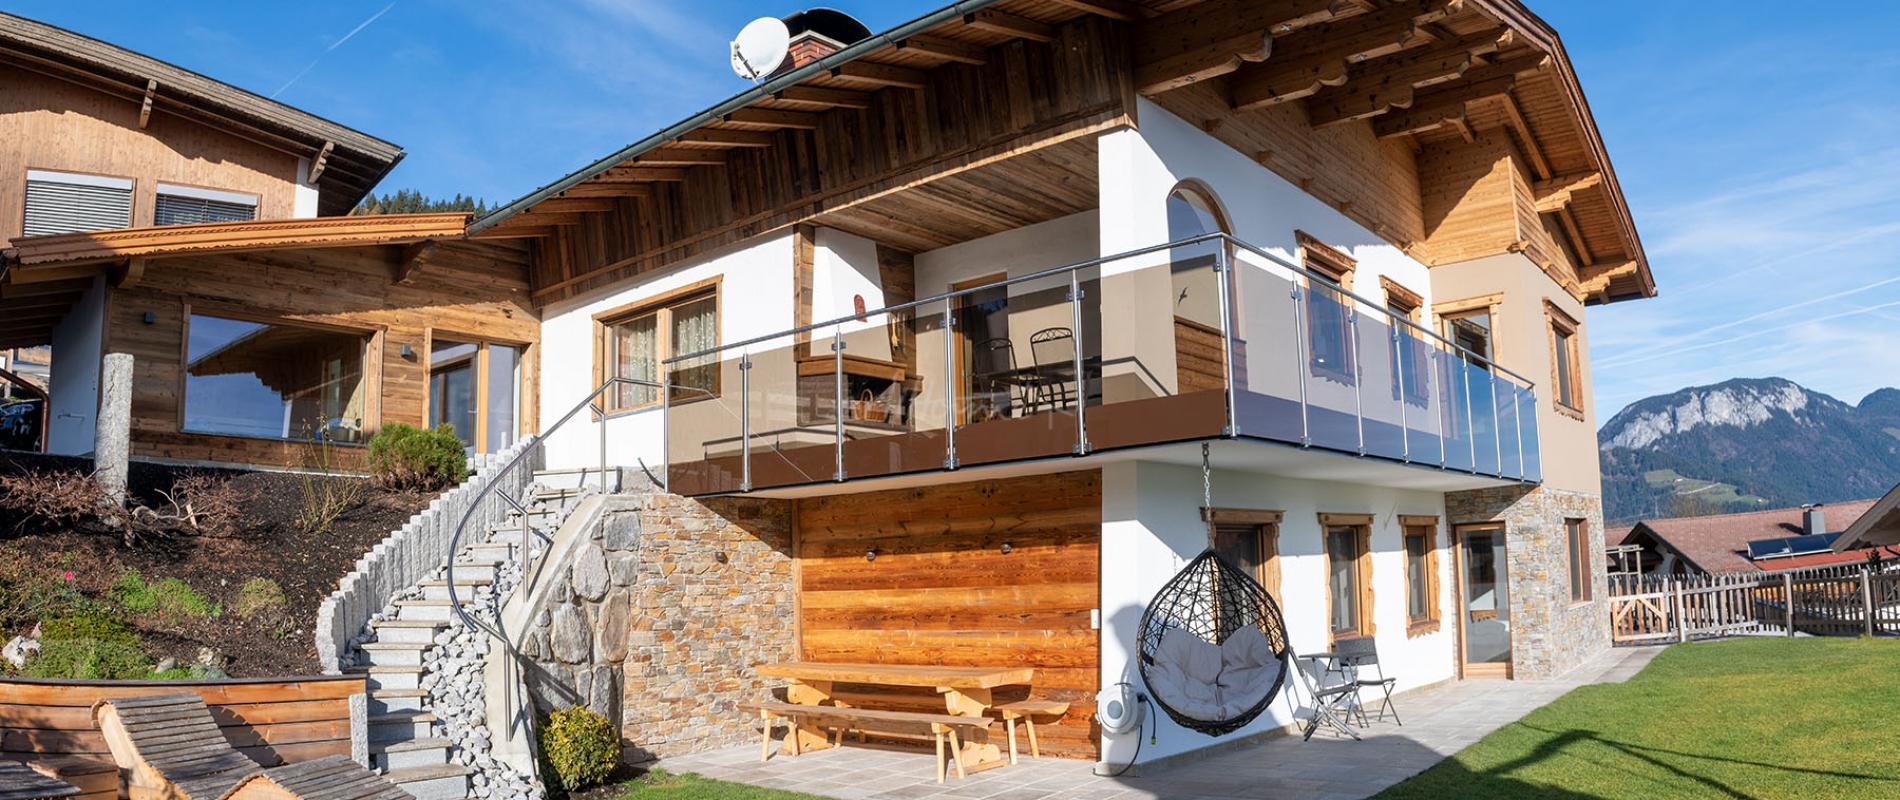 Ferienhaus in Kitzbühel, Tirol